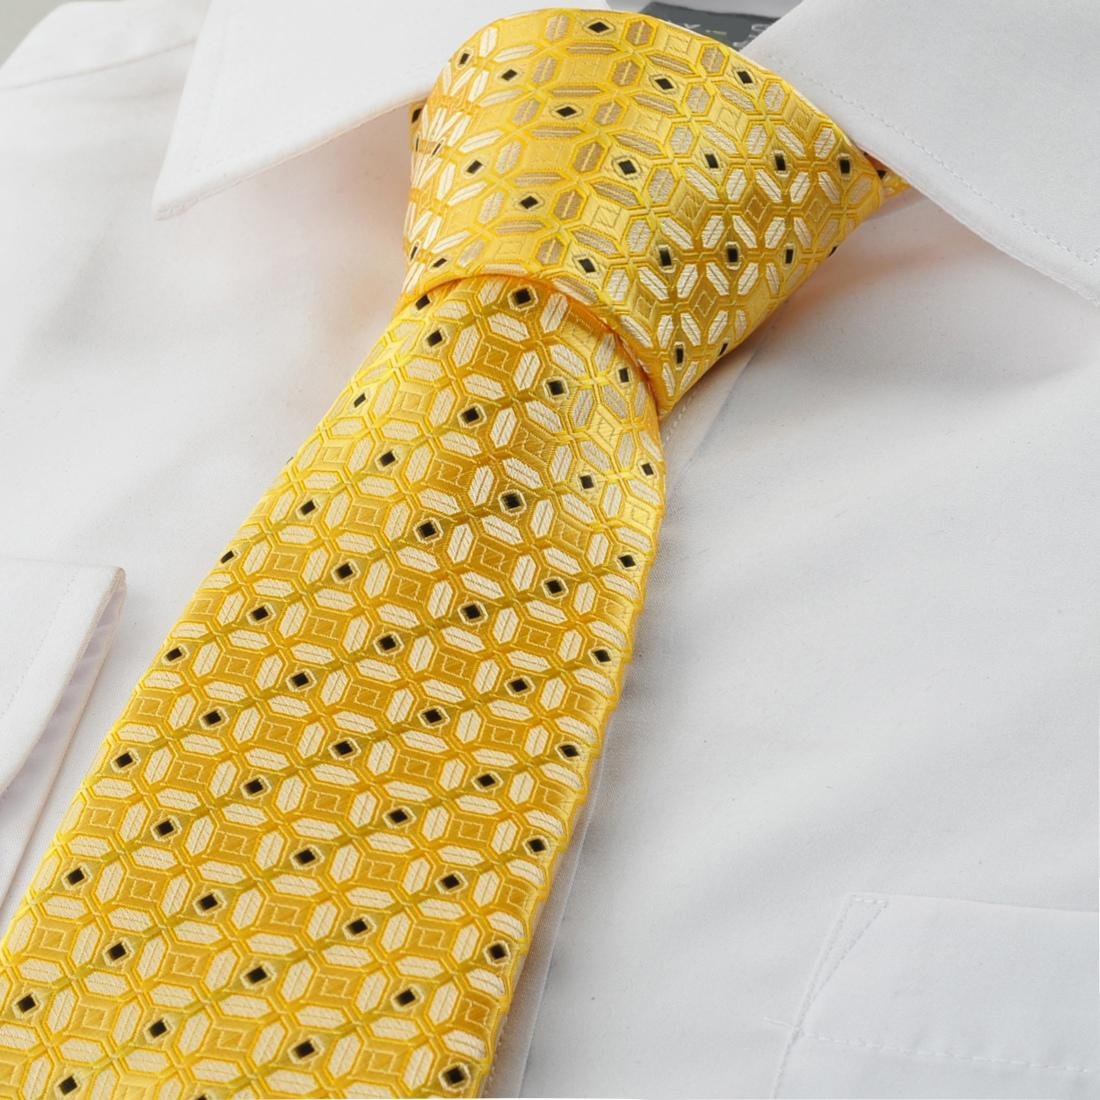 sweettime(tm) Nueva gráfica Golden Amarillo Traje Corbata para ...